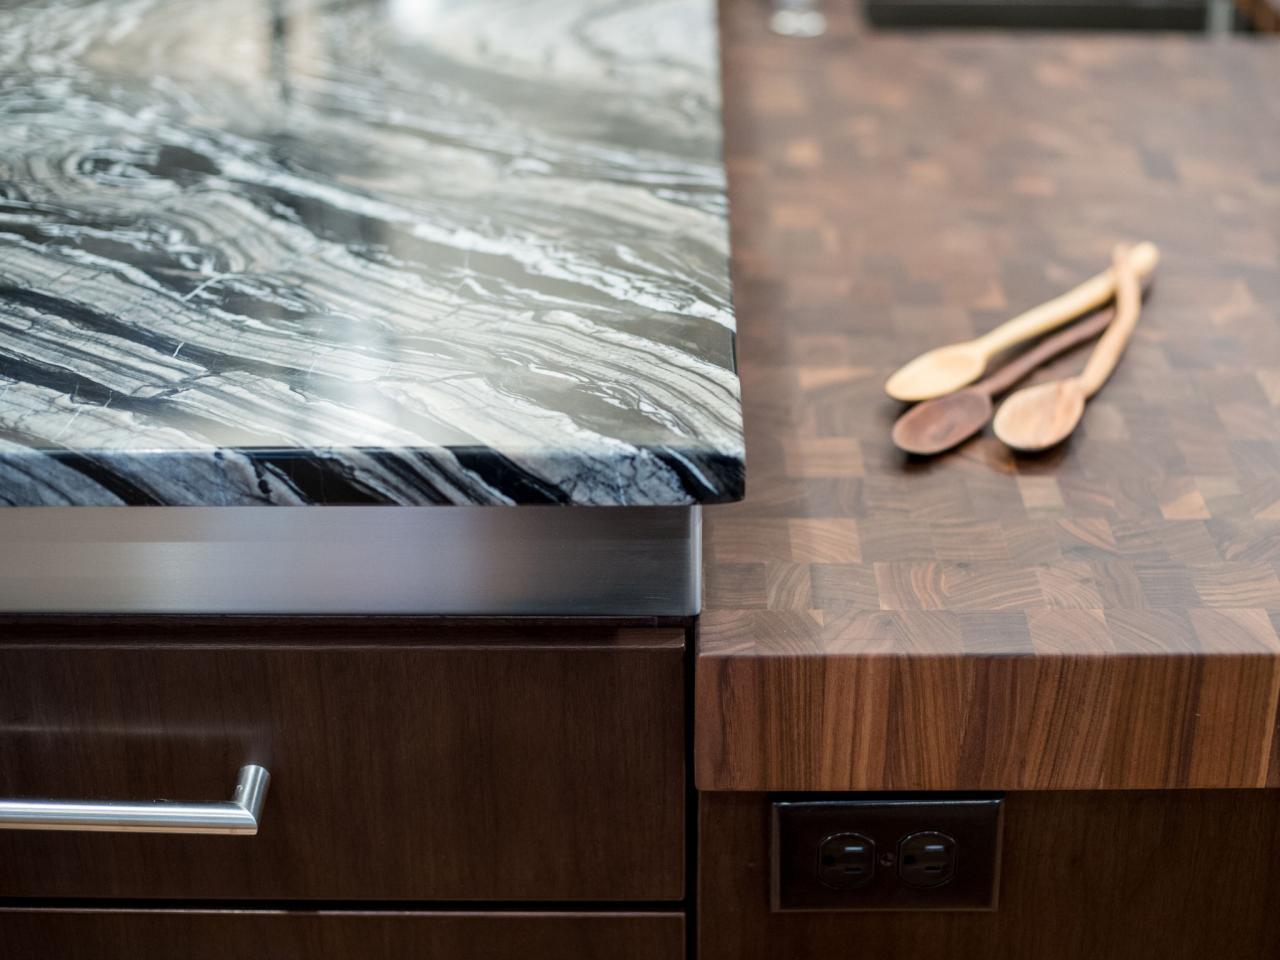 Kitchen Island Countertop kitchen island countertop considerations | hgtv